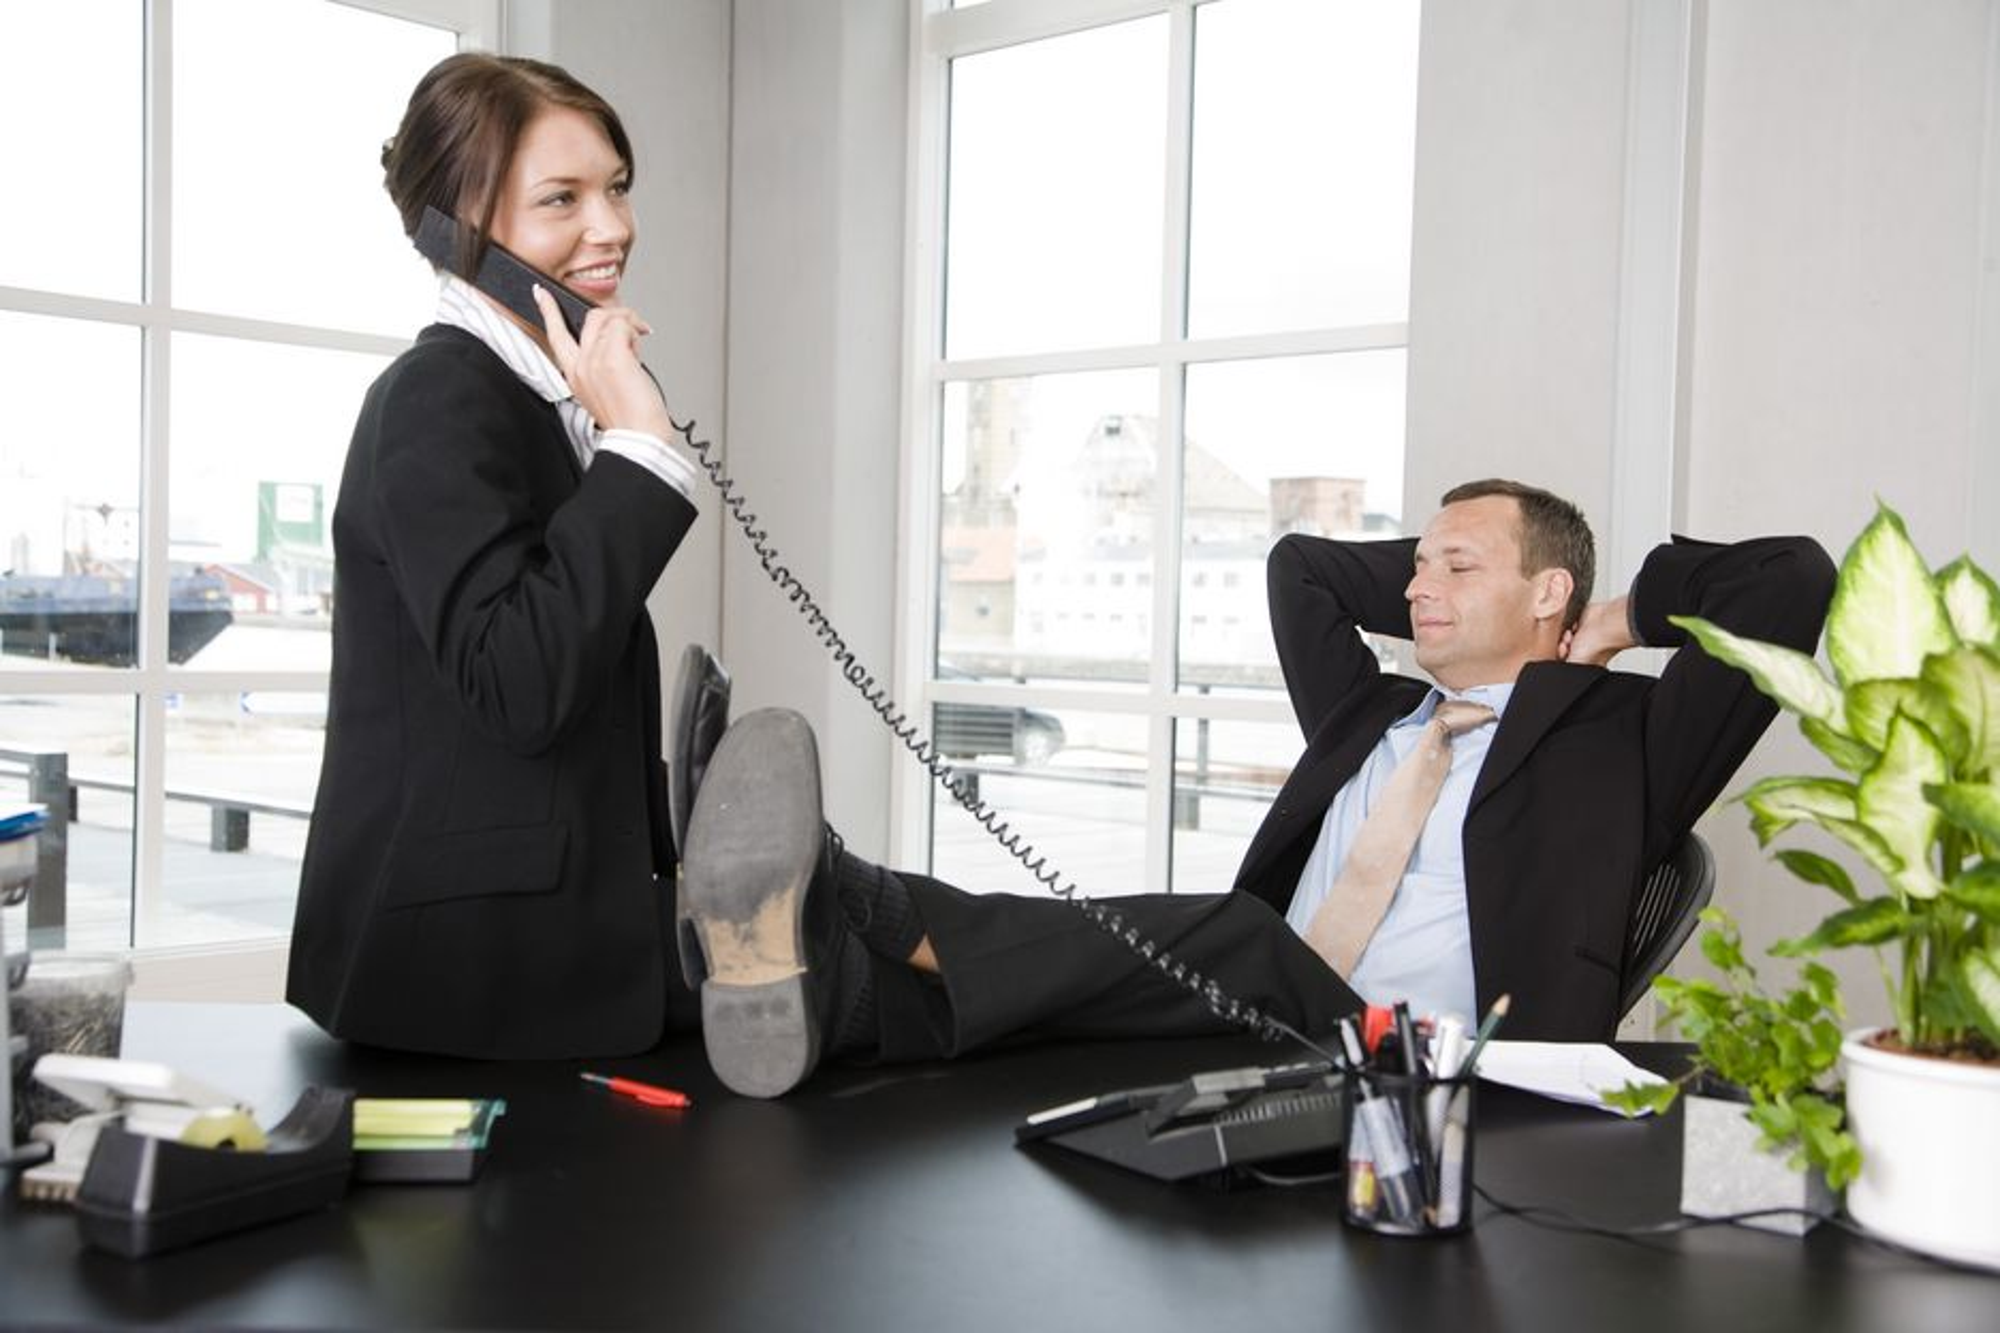 Administrerende direktører sitter sikrere i krisetider, ifølge rapport.